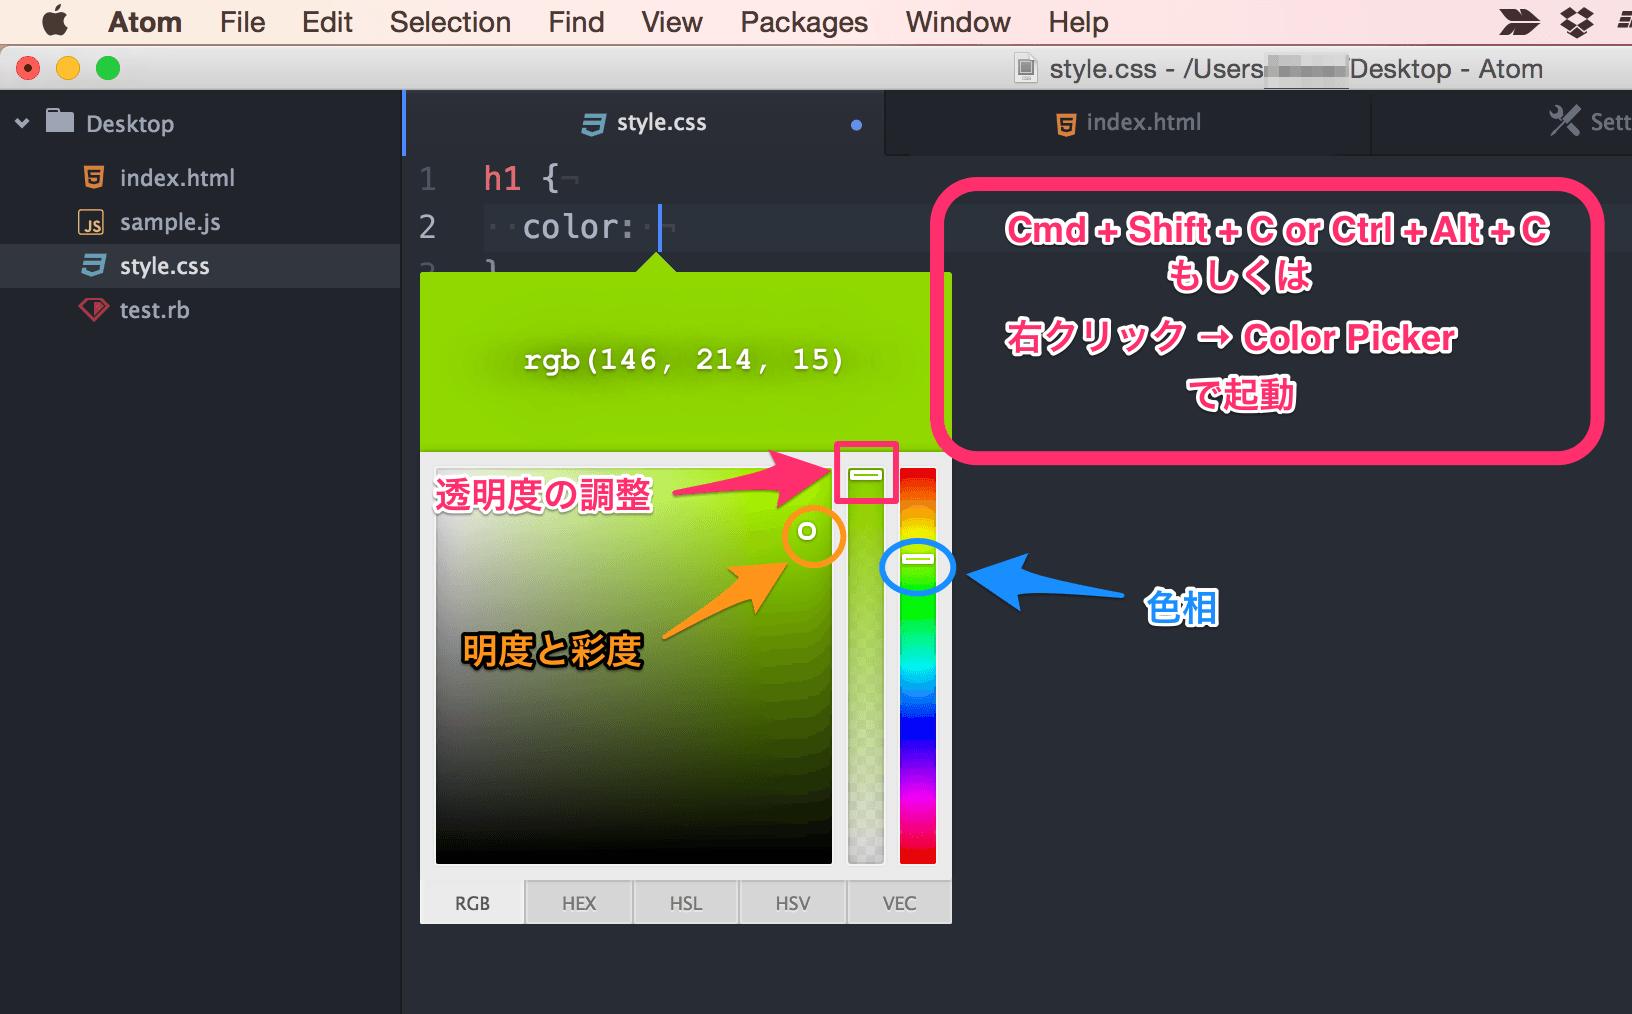 Color Pickerの簡単な説明